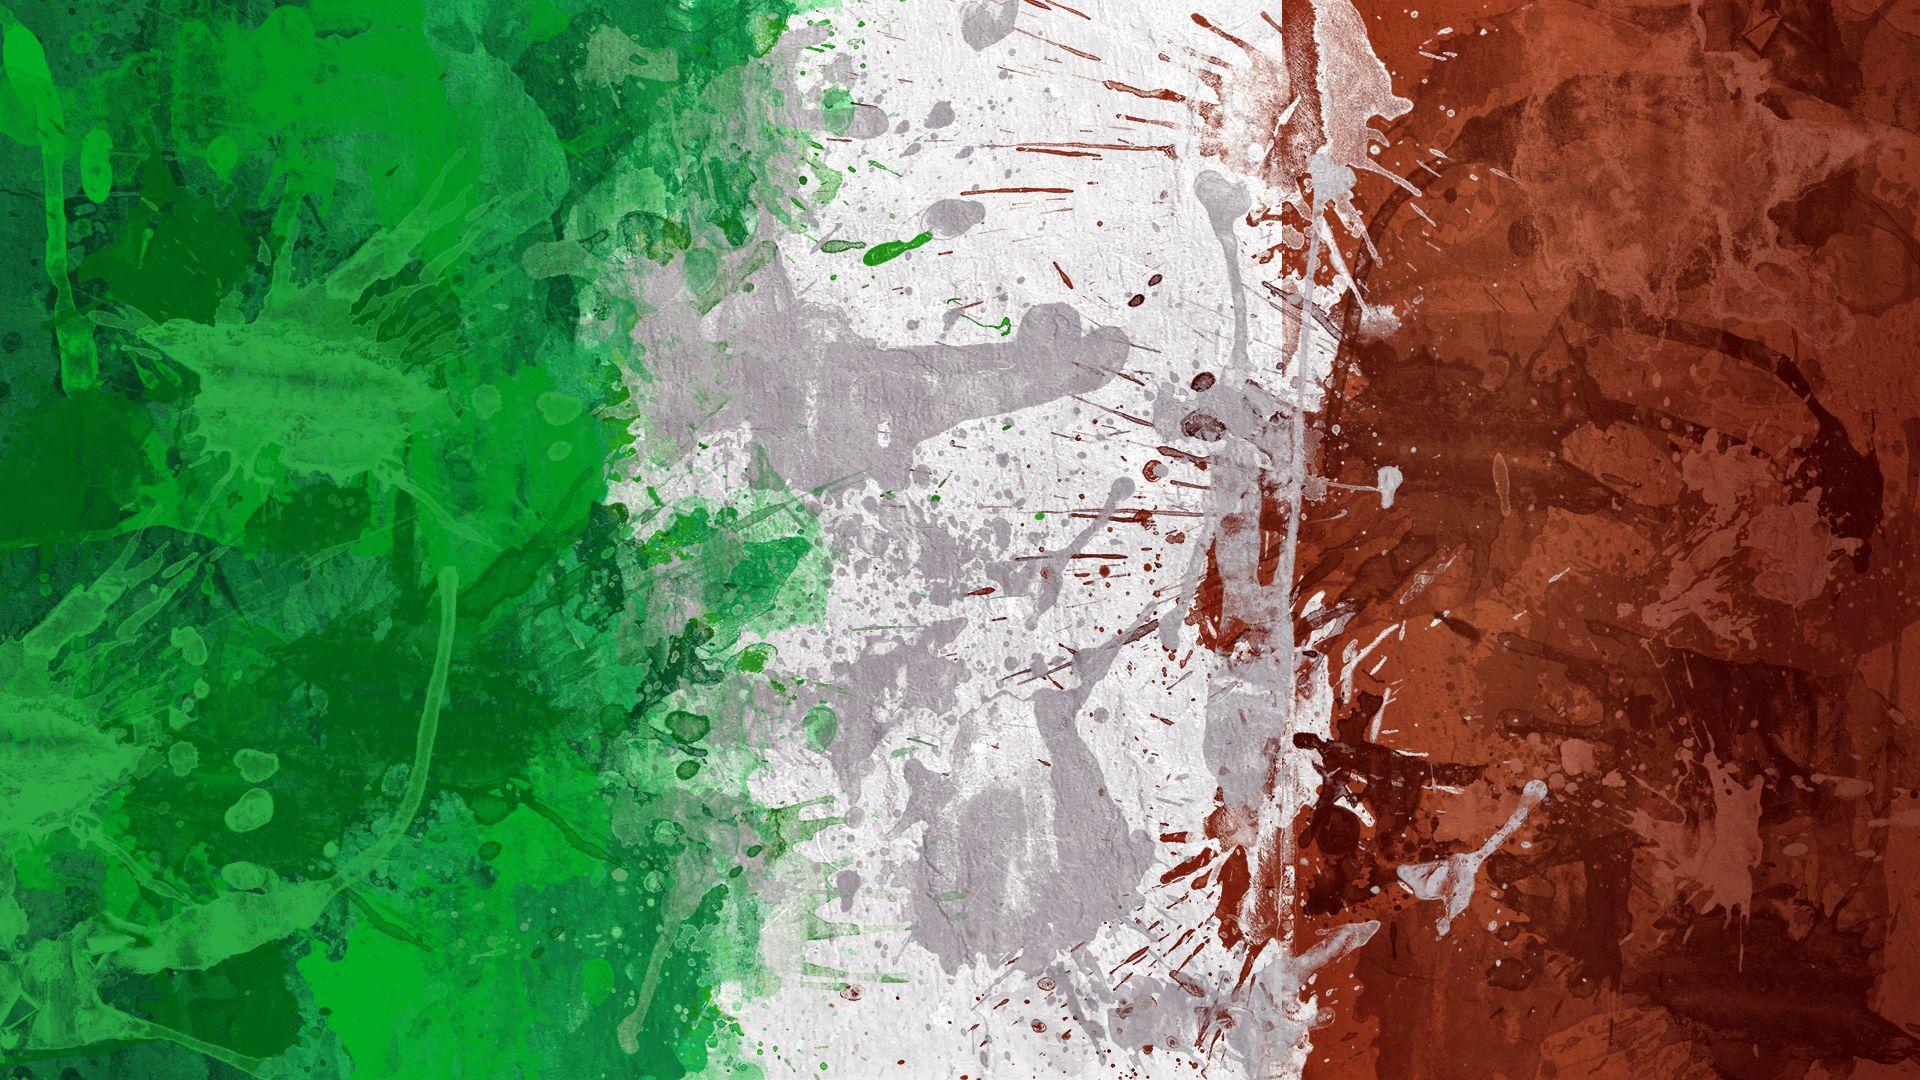 Italian Wallpapers   Top Italian Backgrounds   WallpaperAccess 1920x1080